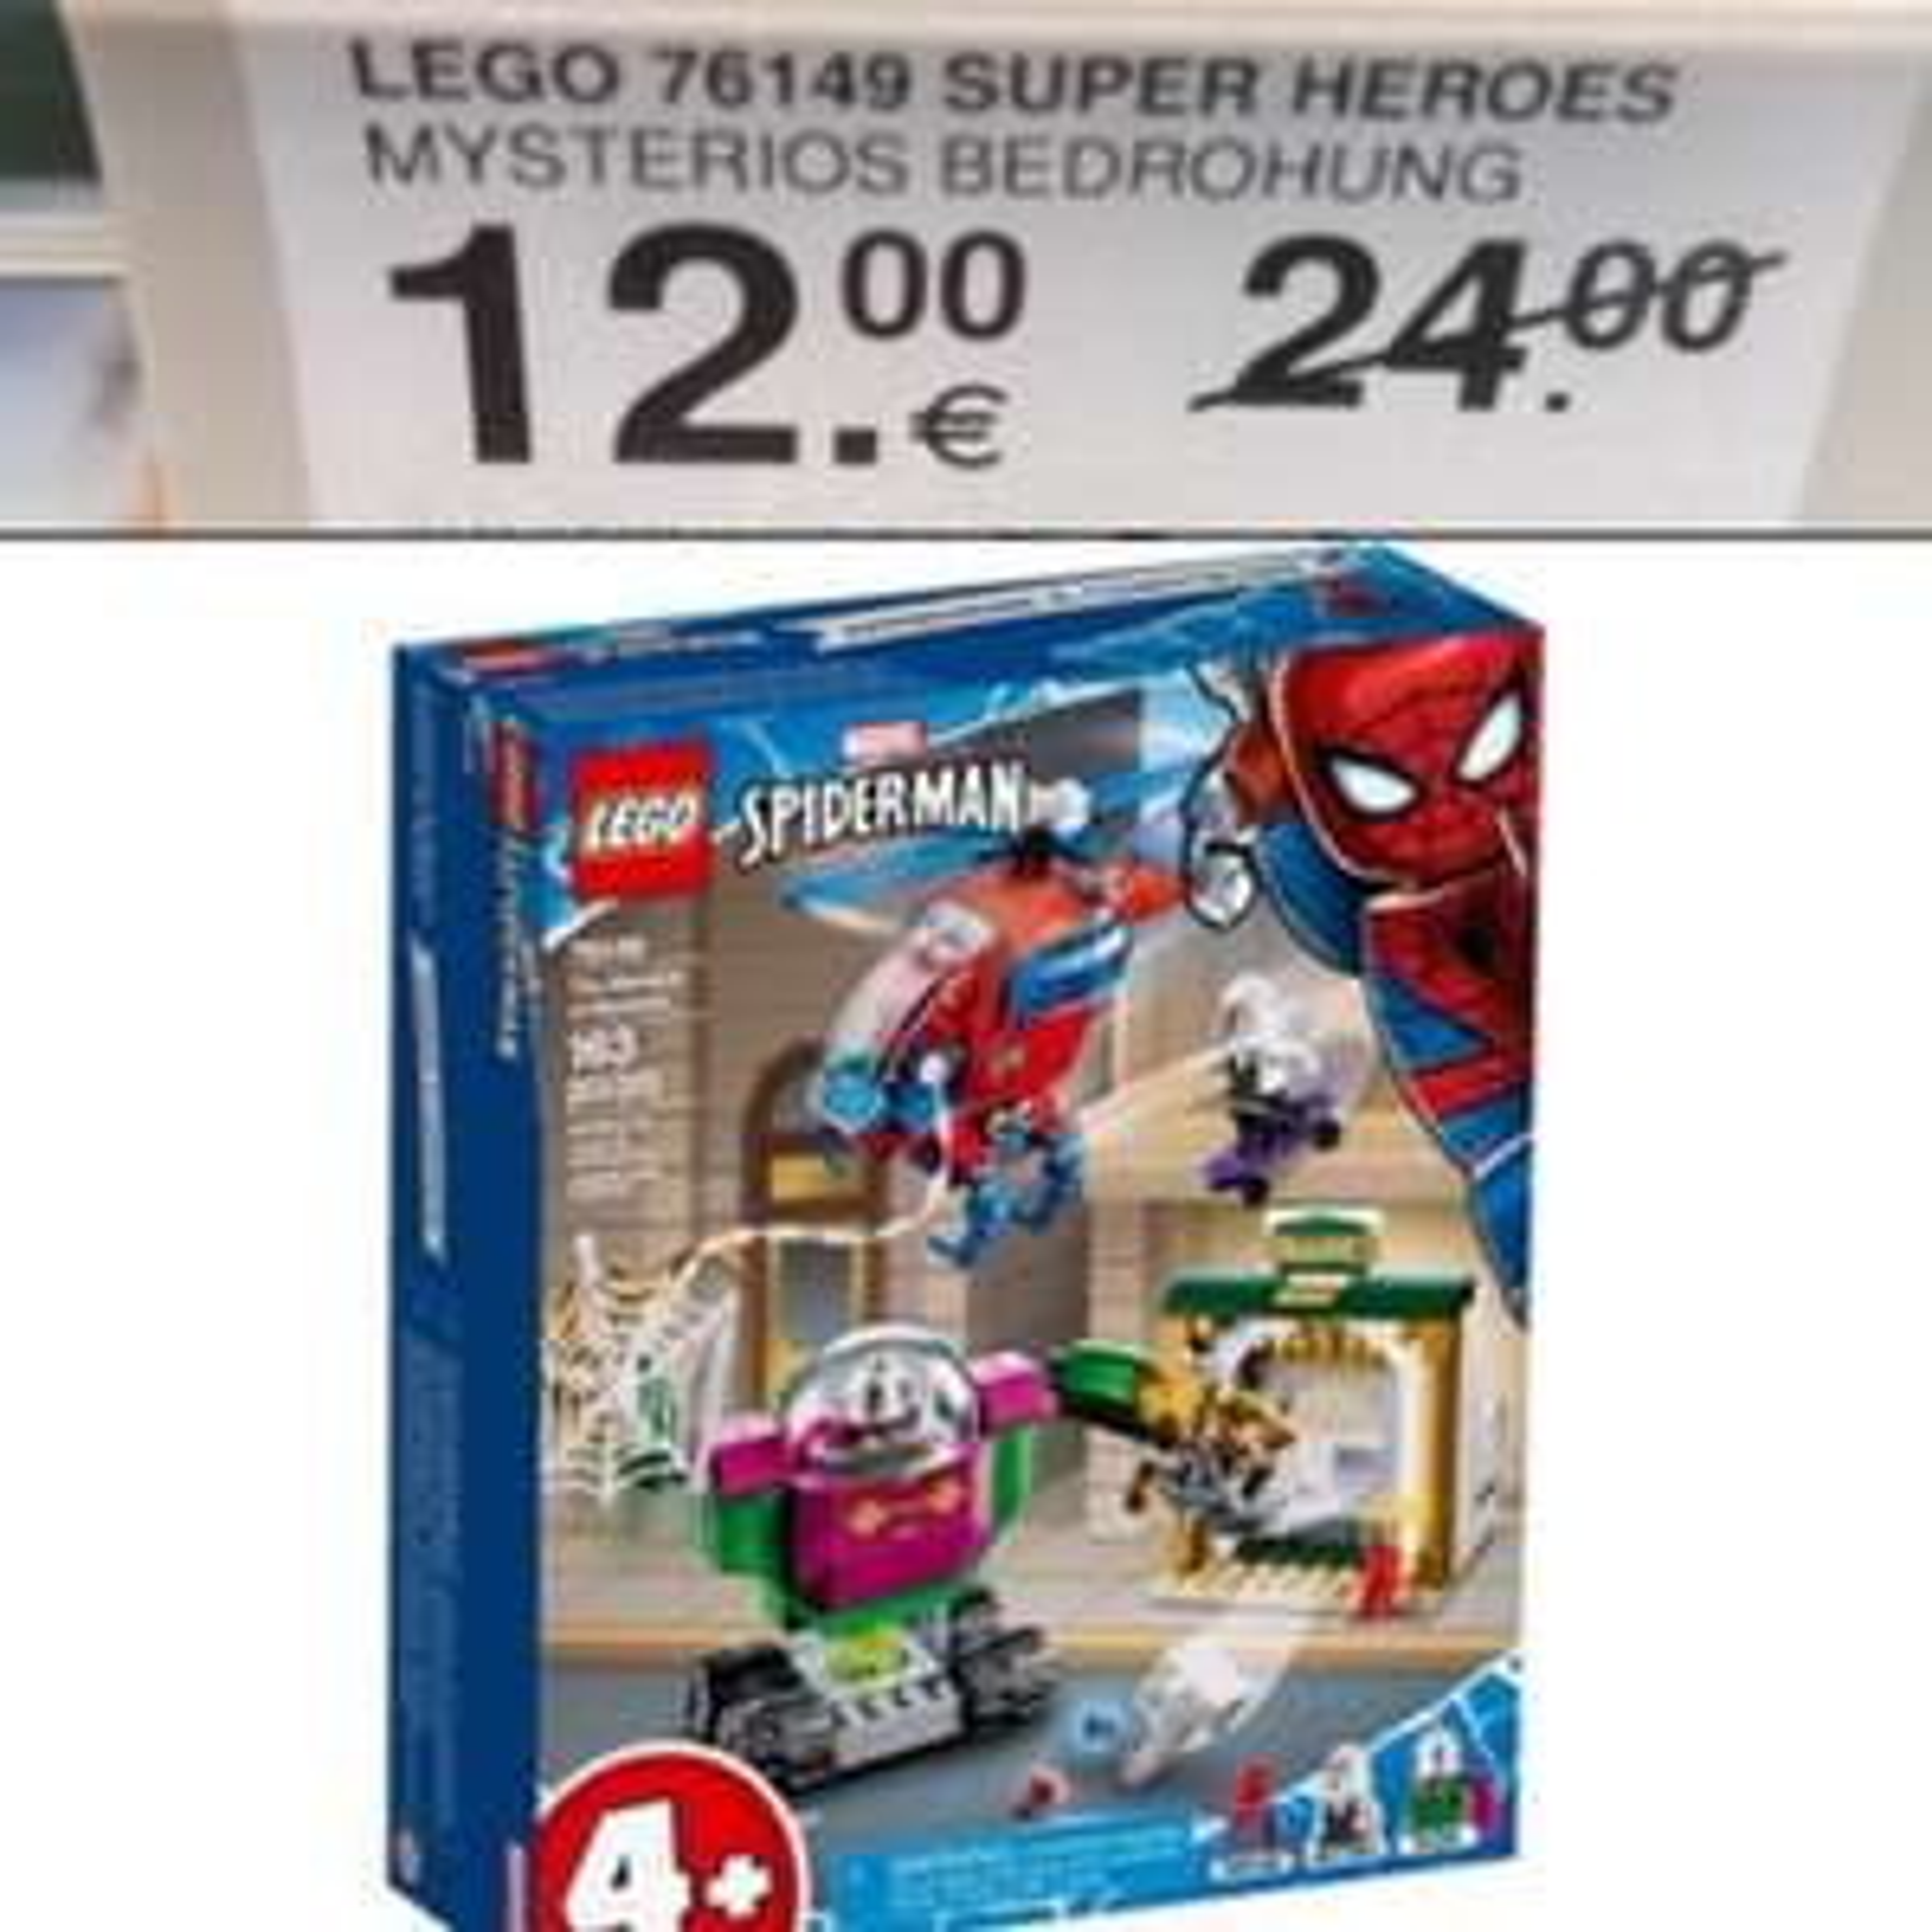 Lokal Müller Viernheim RNZ LEGO Super Heroes 76149 Mysterios Bedrohung Spiderman